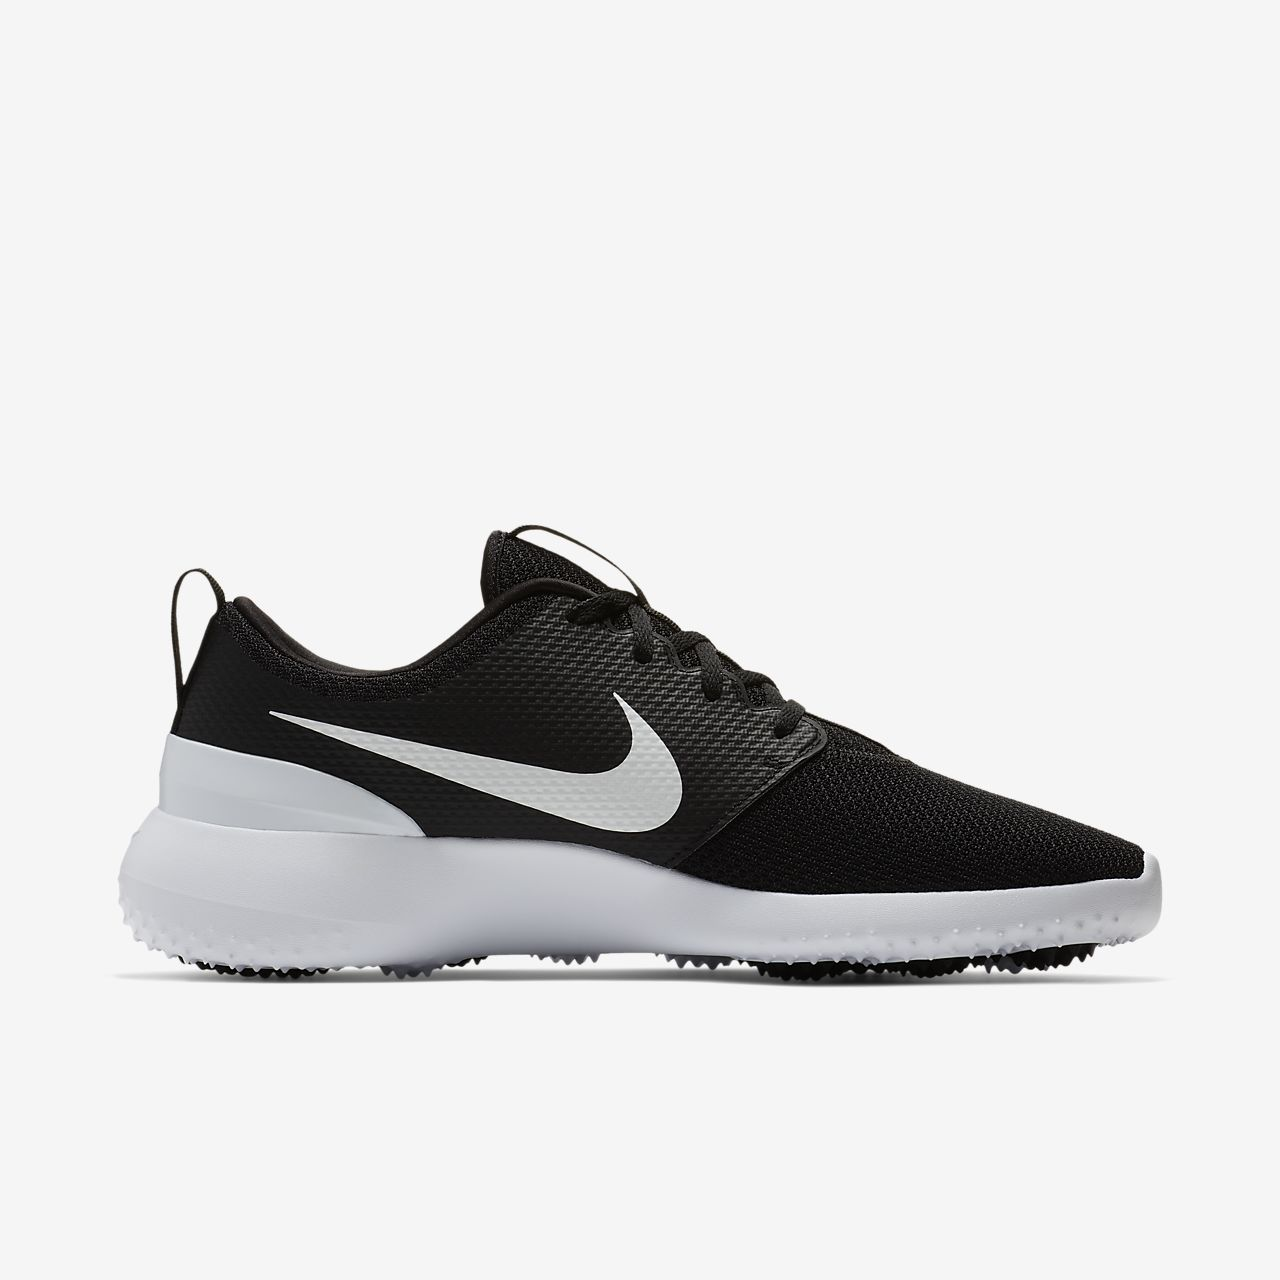 caf05de8ed09 Nike Roshe G Men s Golf Shoe. Nike.com CH